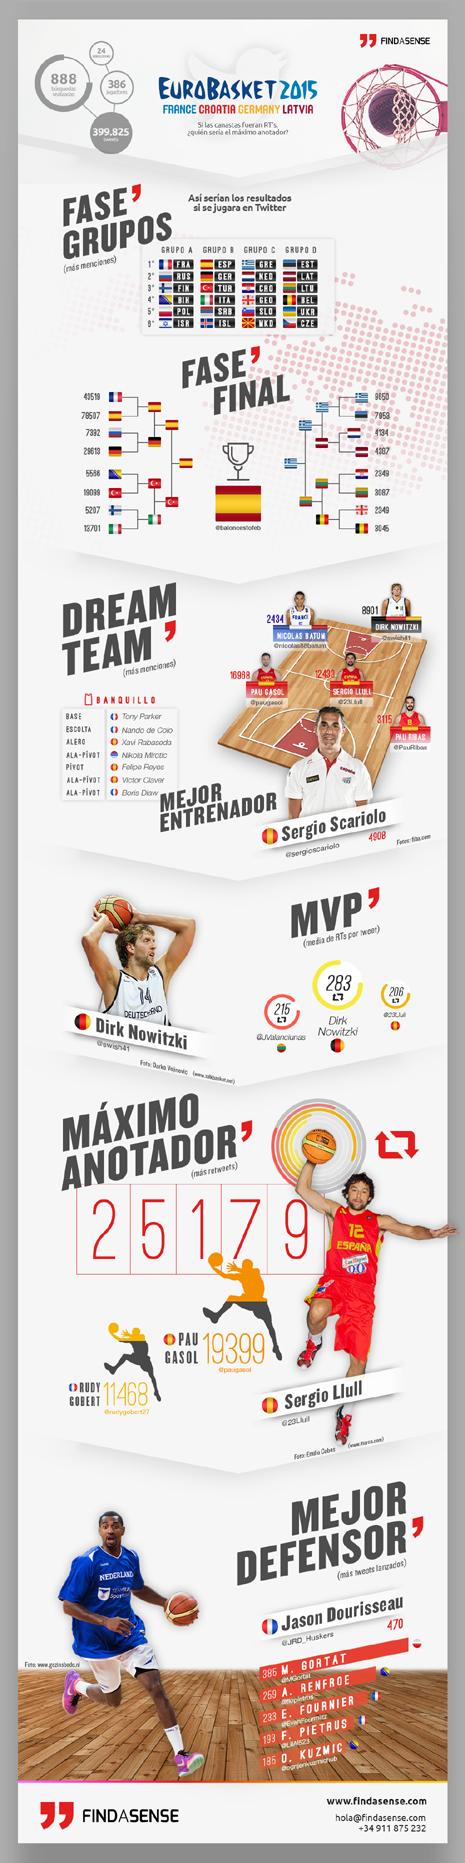 EuroBasket 2015 Findasense